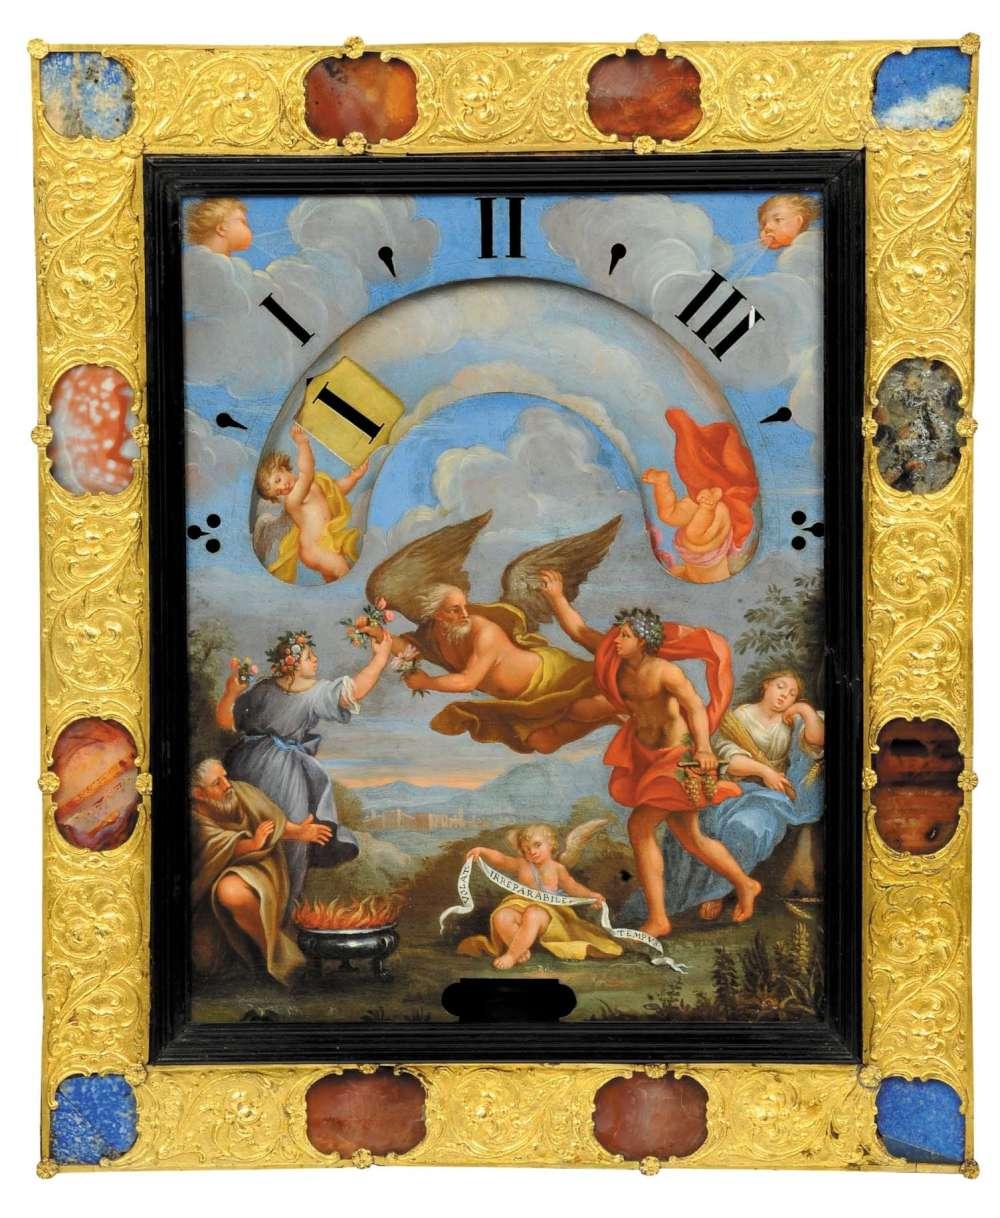 Night clock, Rome, 1682, by Pietro Tommaso Campani, Carlo Maratta and Giacomo Hermann (attr.), photo www.cambiaste.com